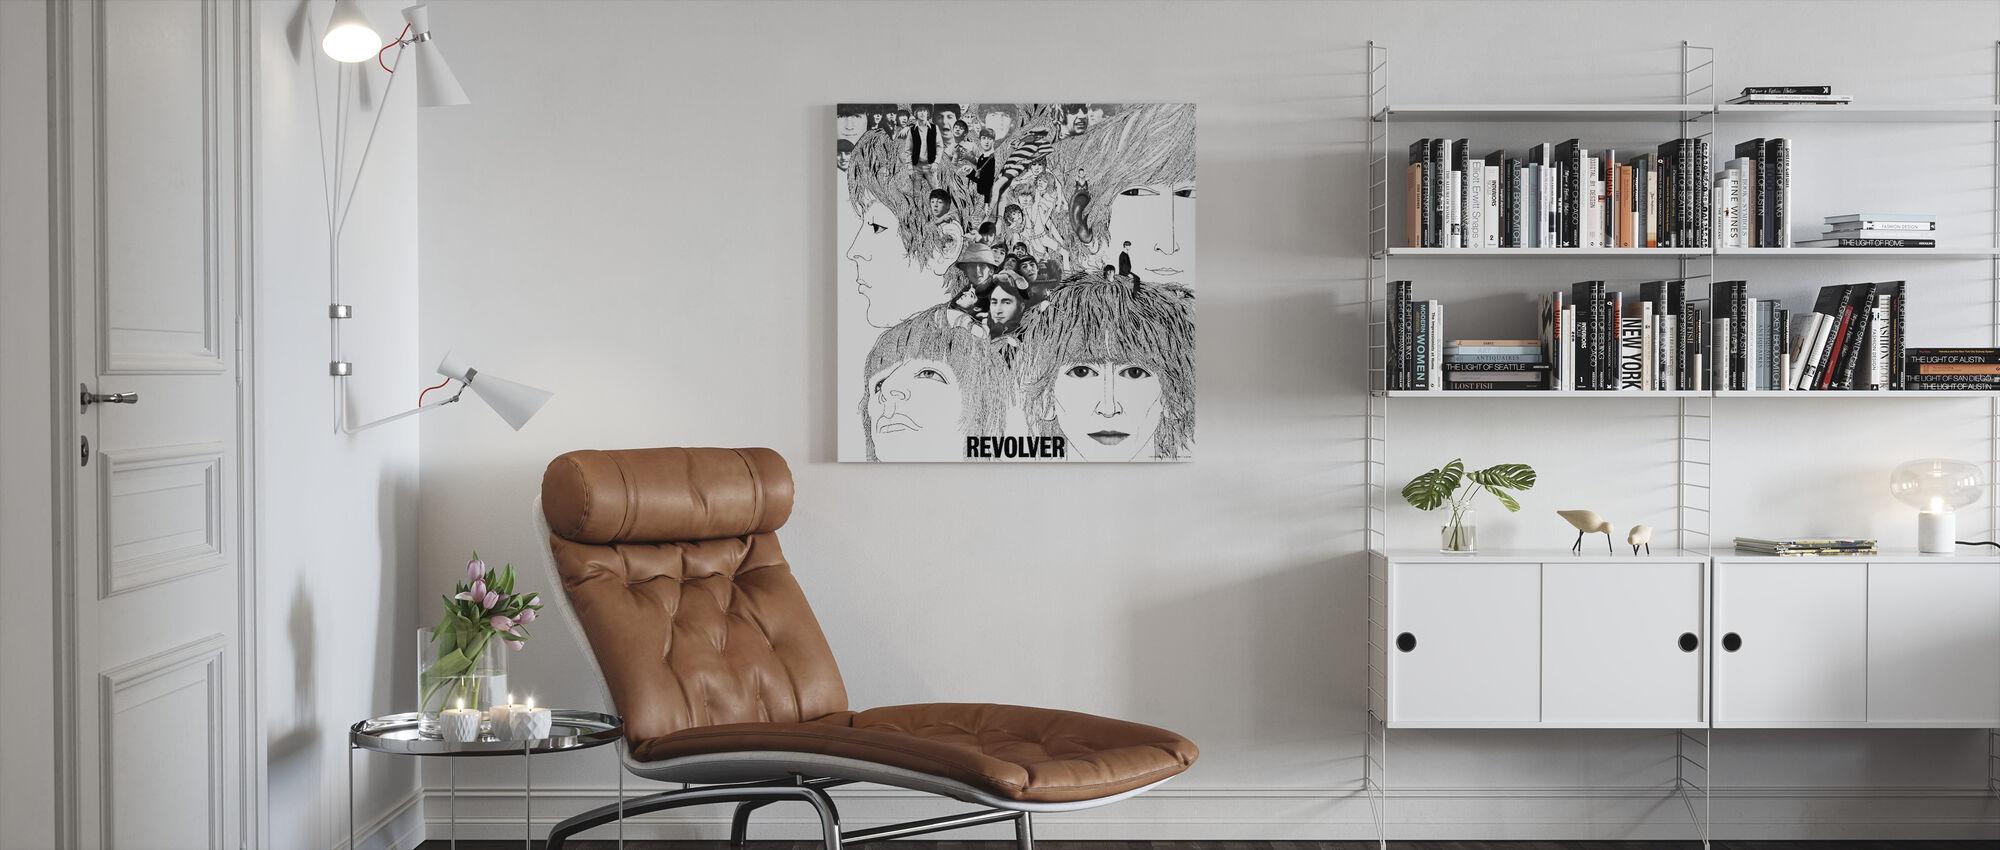 Beatles - Revolveri - Canvastaulu - Olohuone